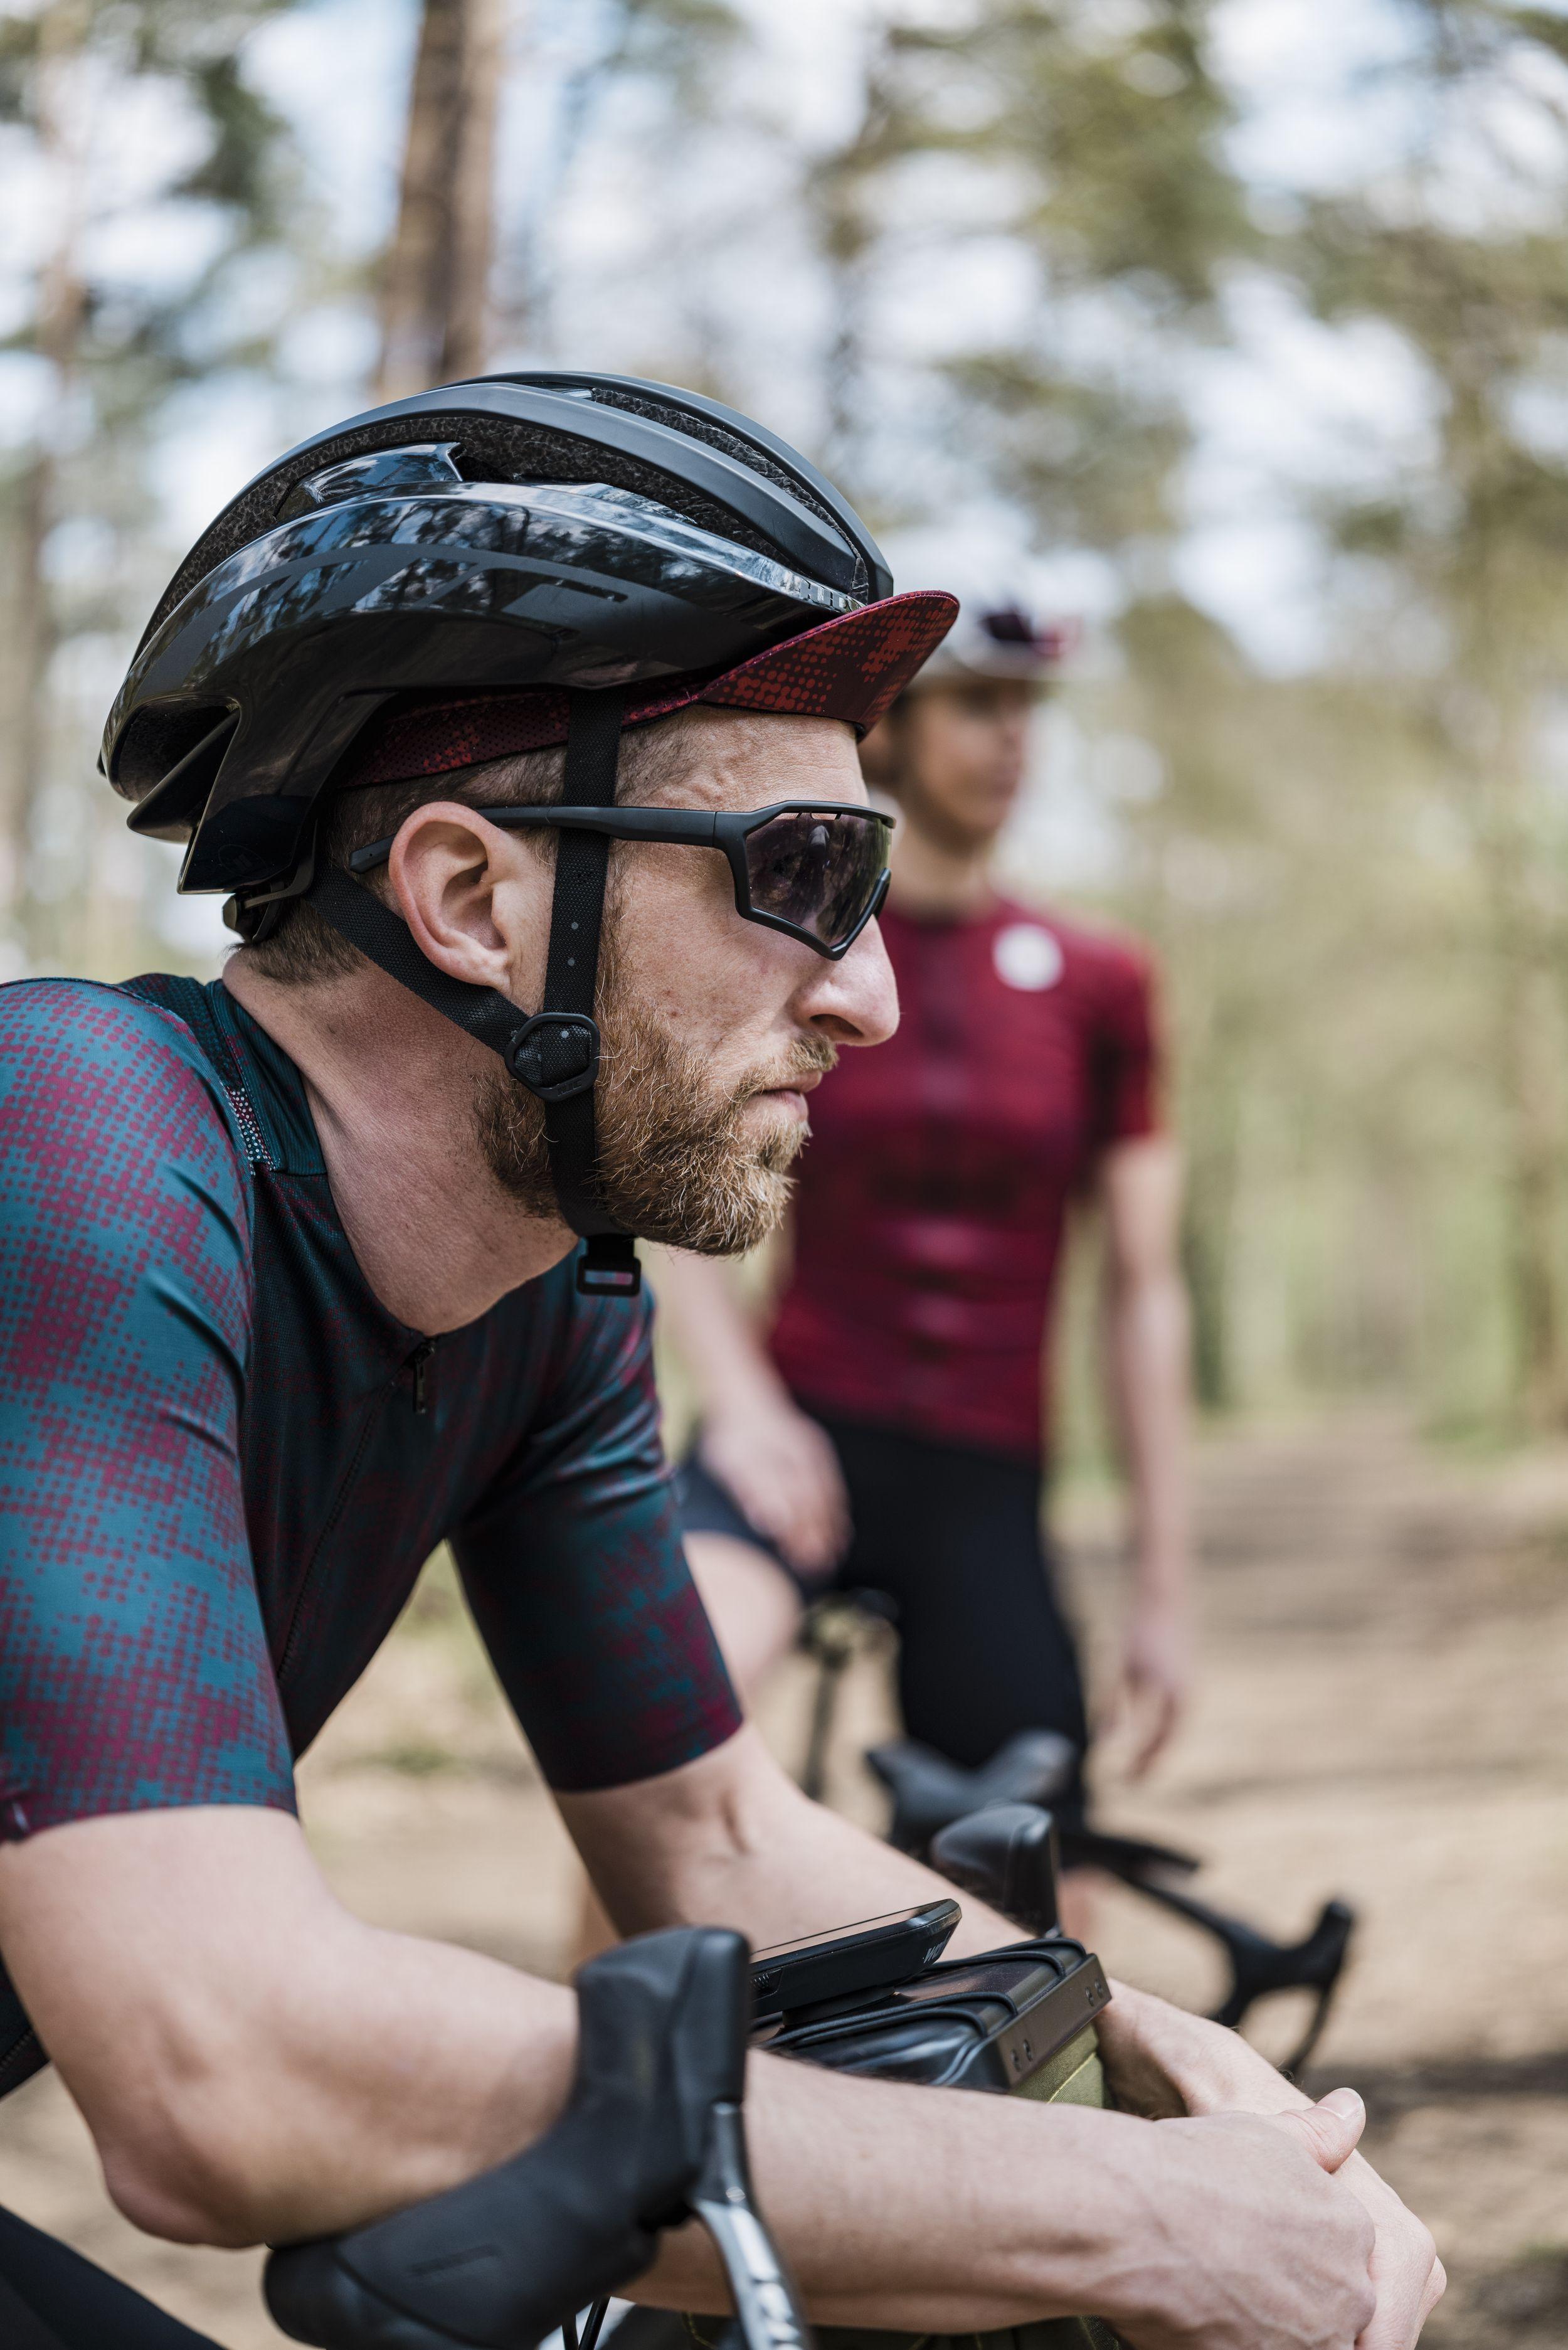 Start jouw fietsavontuur met Sportful fietskleding